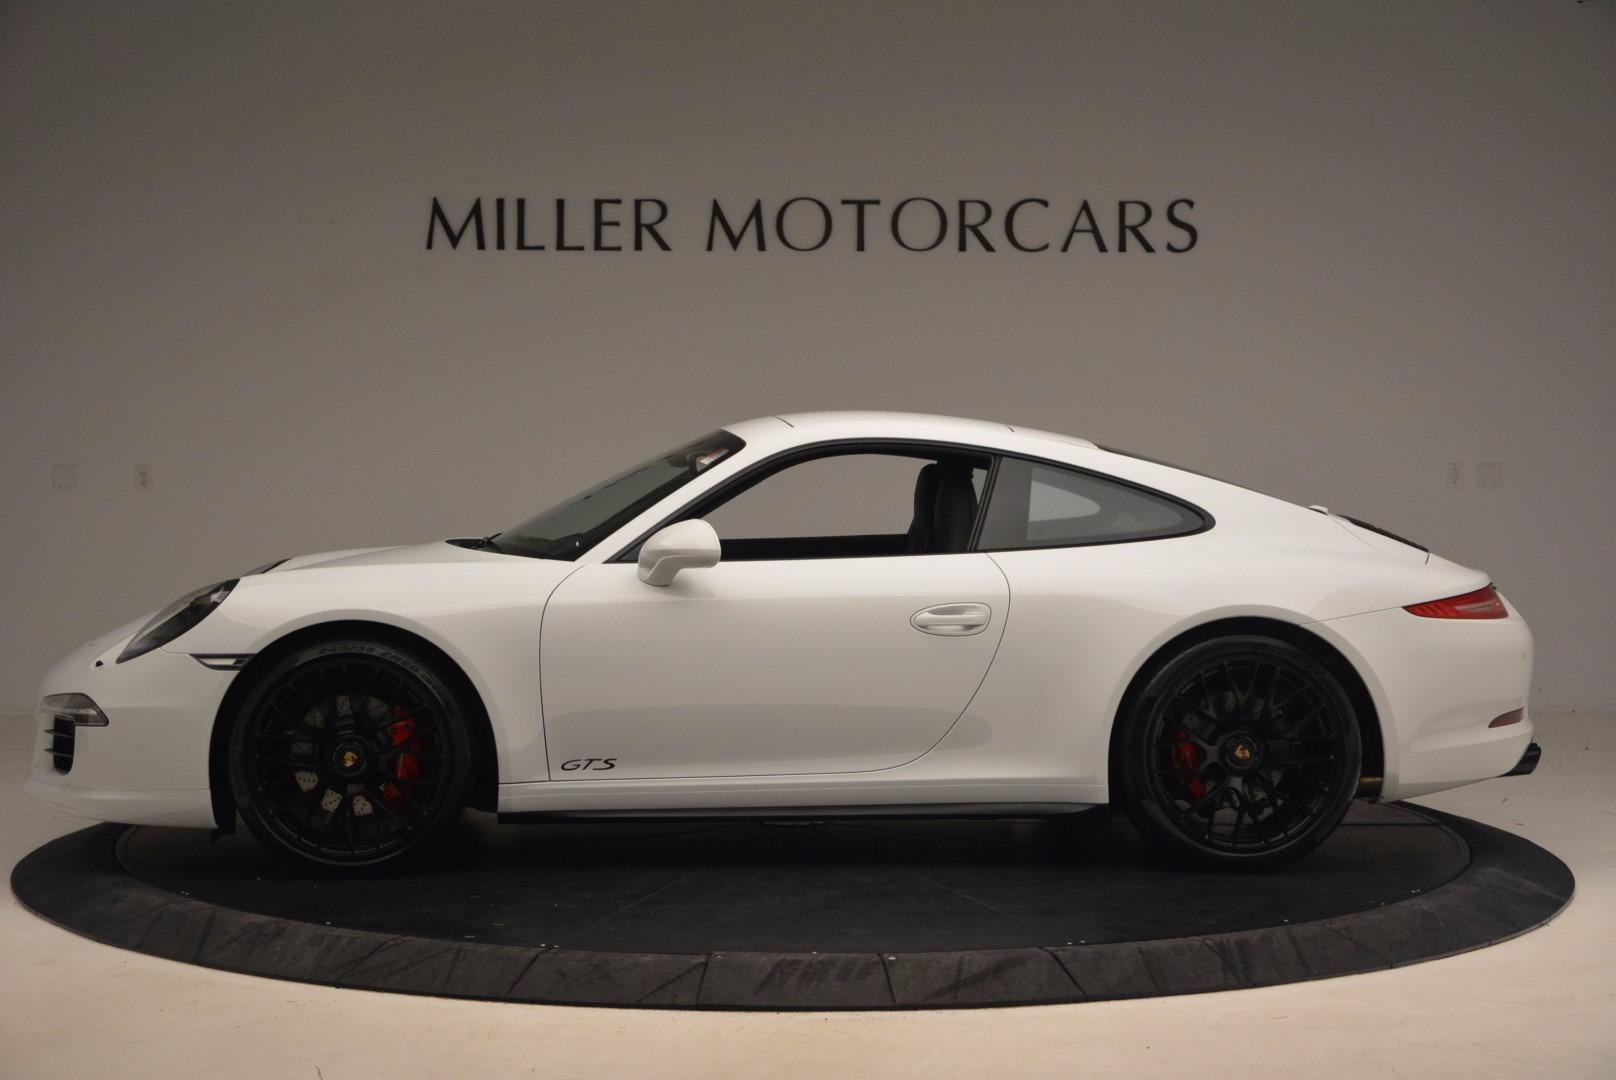 Used 2015 Porsche 911 Carrera GTS For Sale In Greenwich, CT 1444_p3